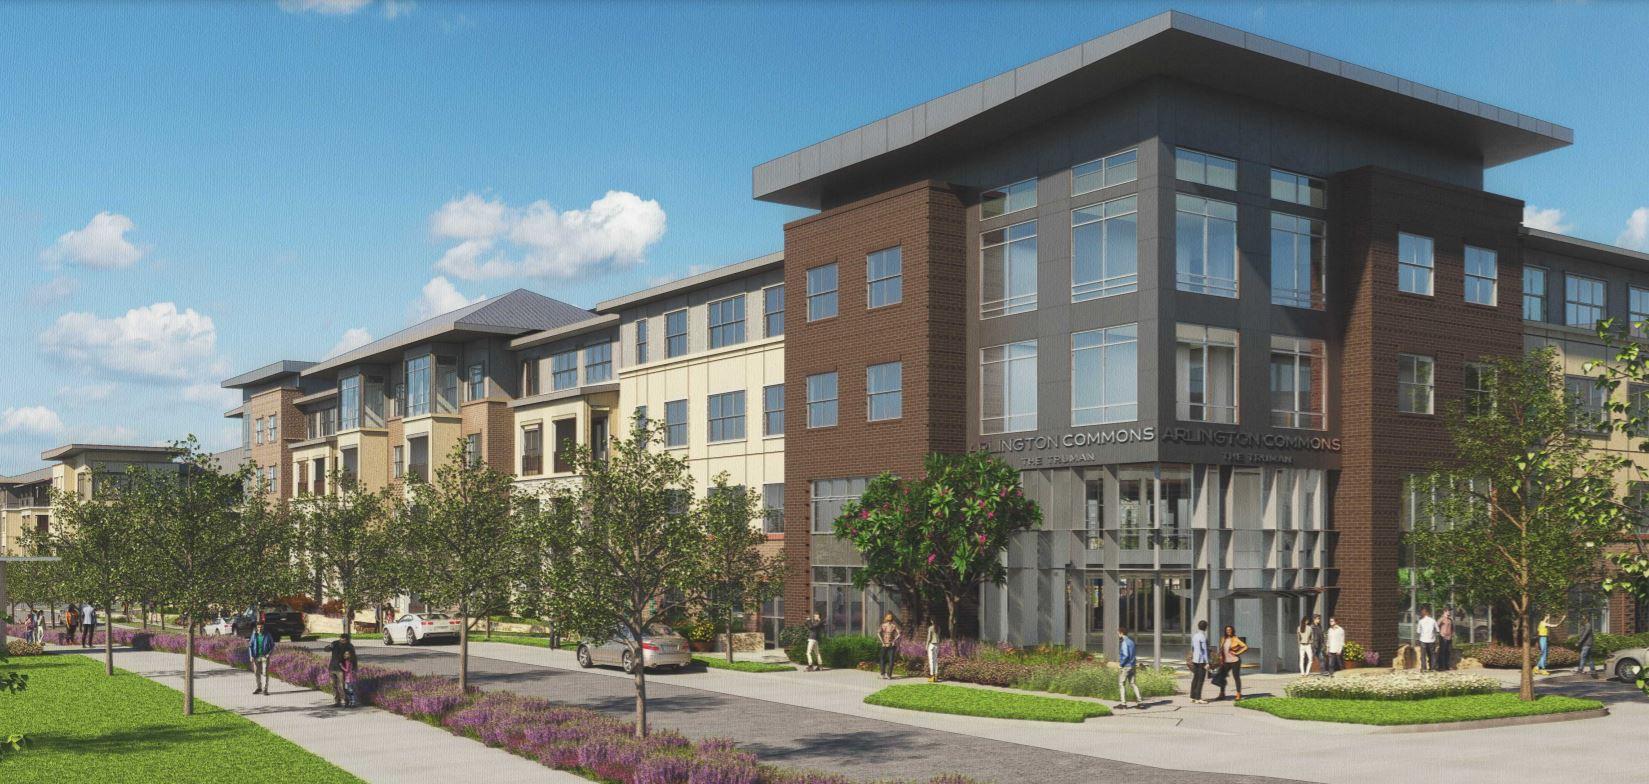 Apartments Near UT Arlington The Truman at Arlington Commons for University of Texas at Arlington Students in Arlington, TX